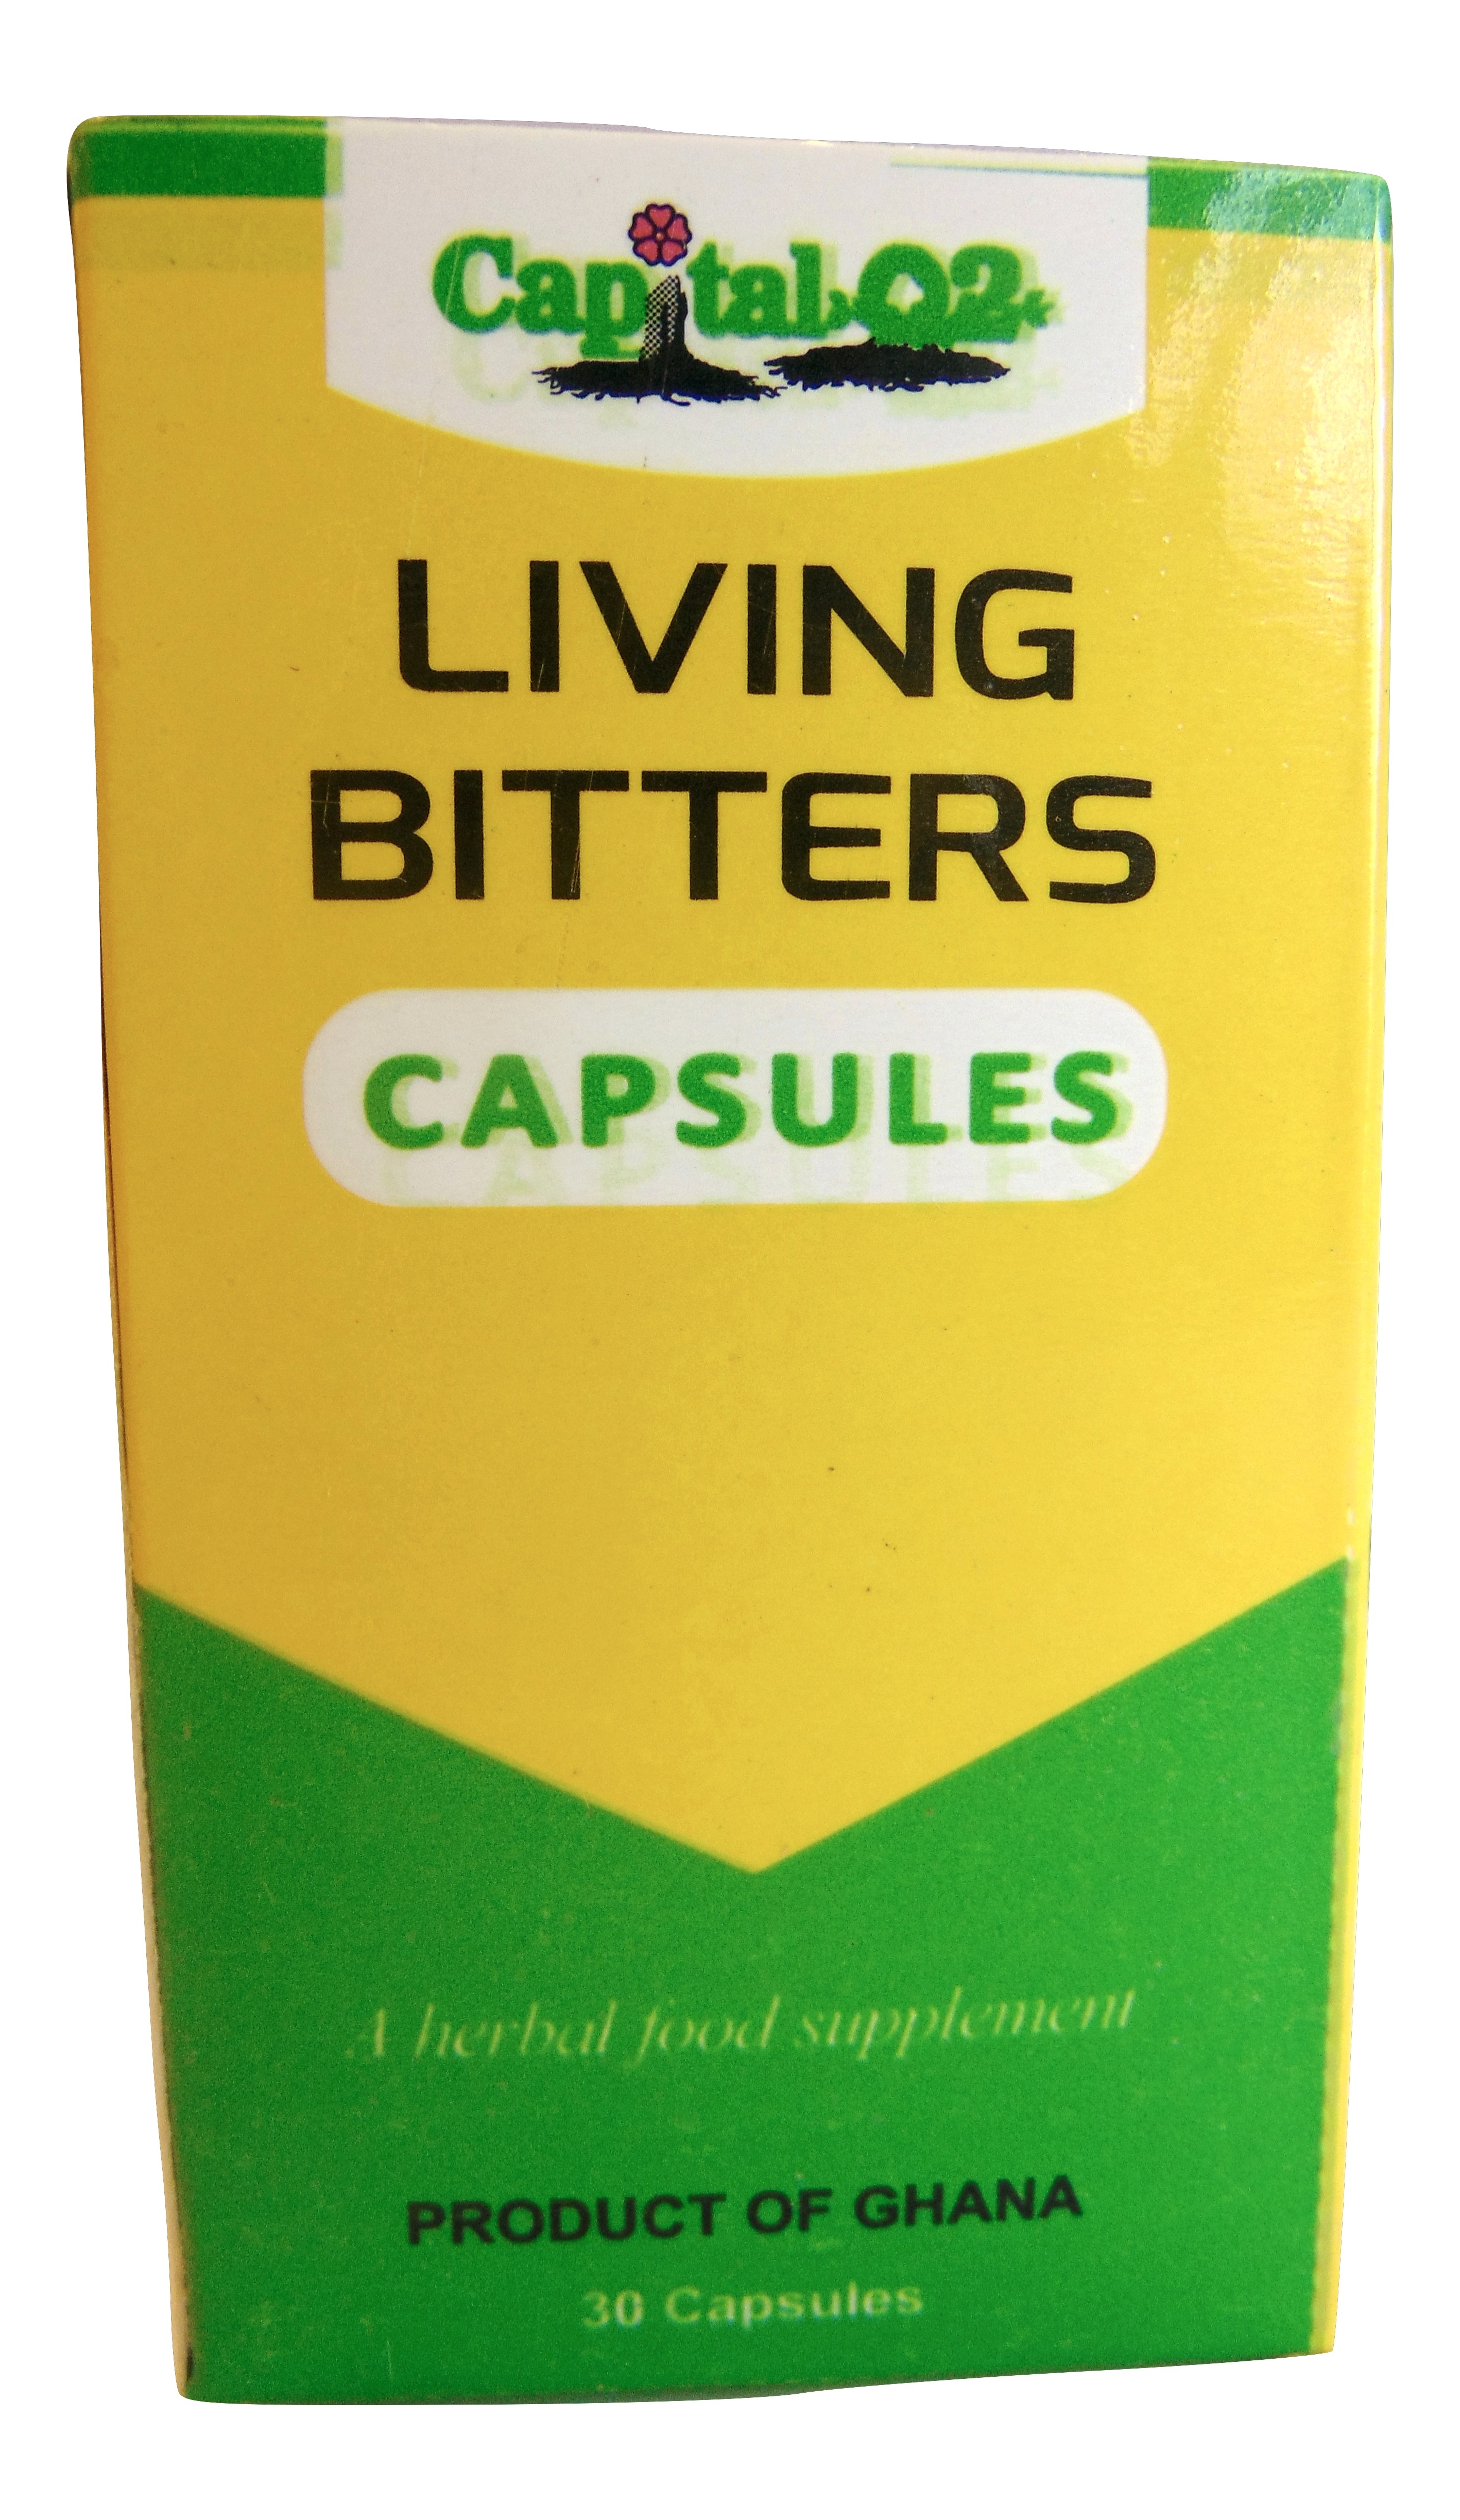 living bitters capsules